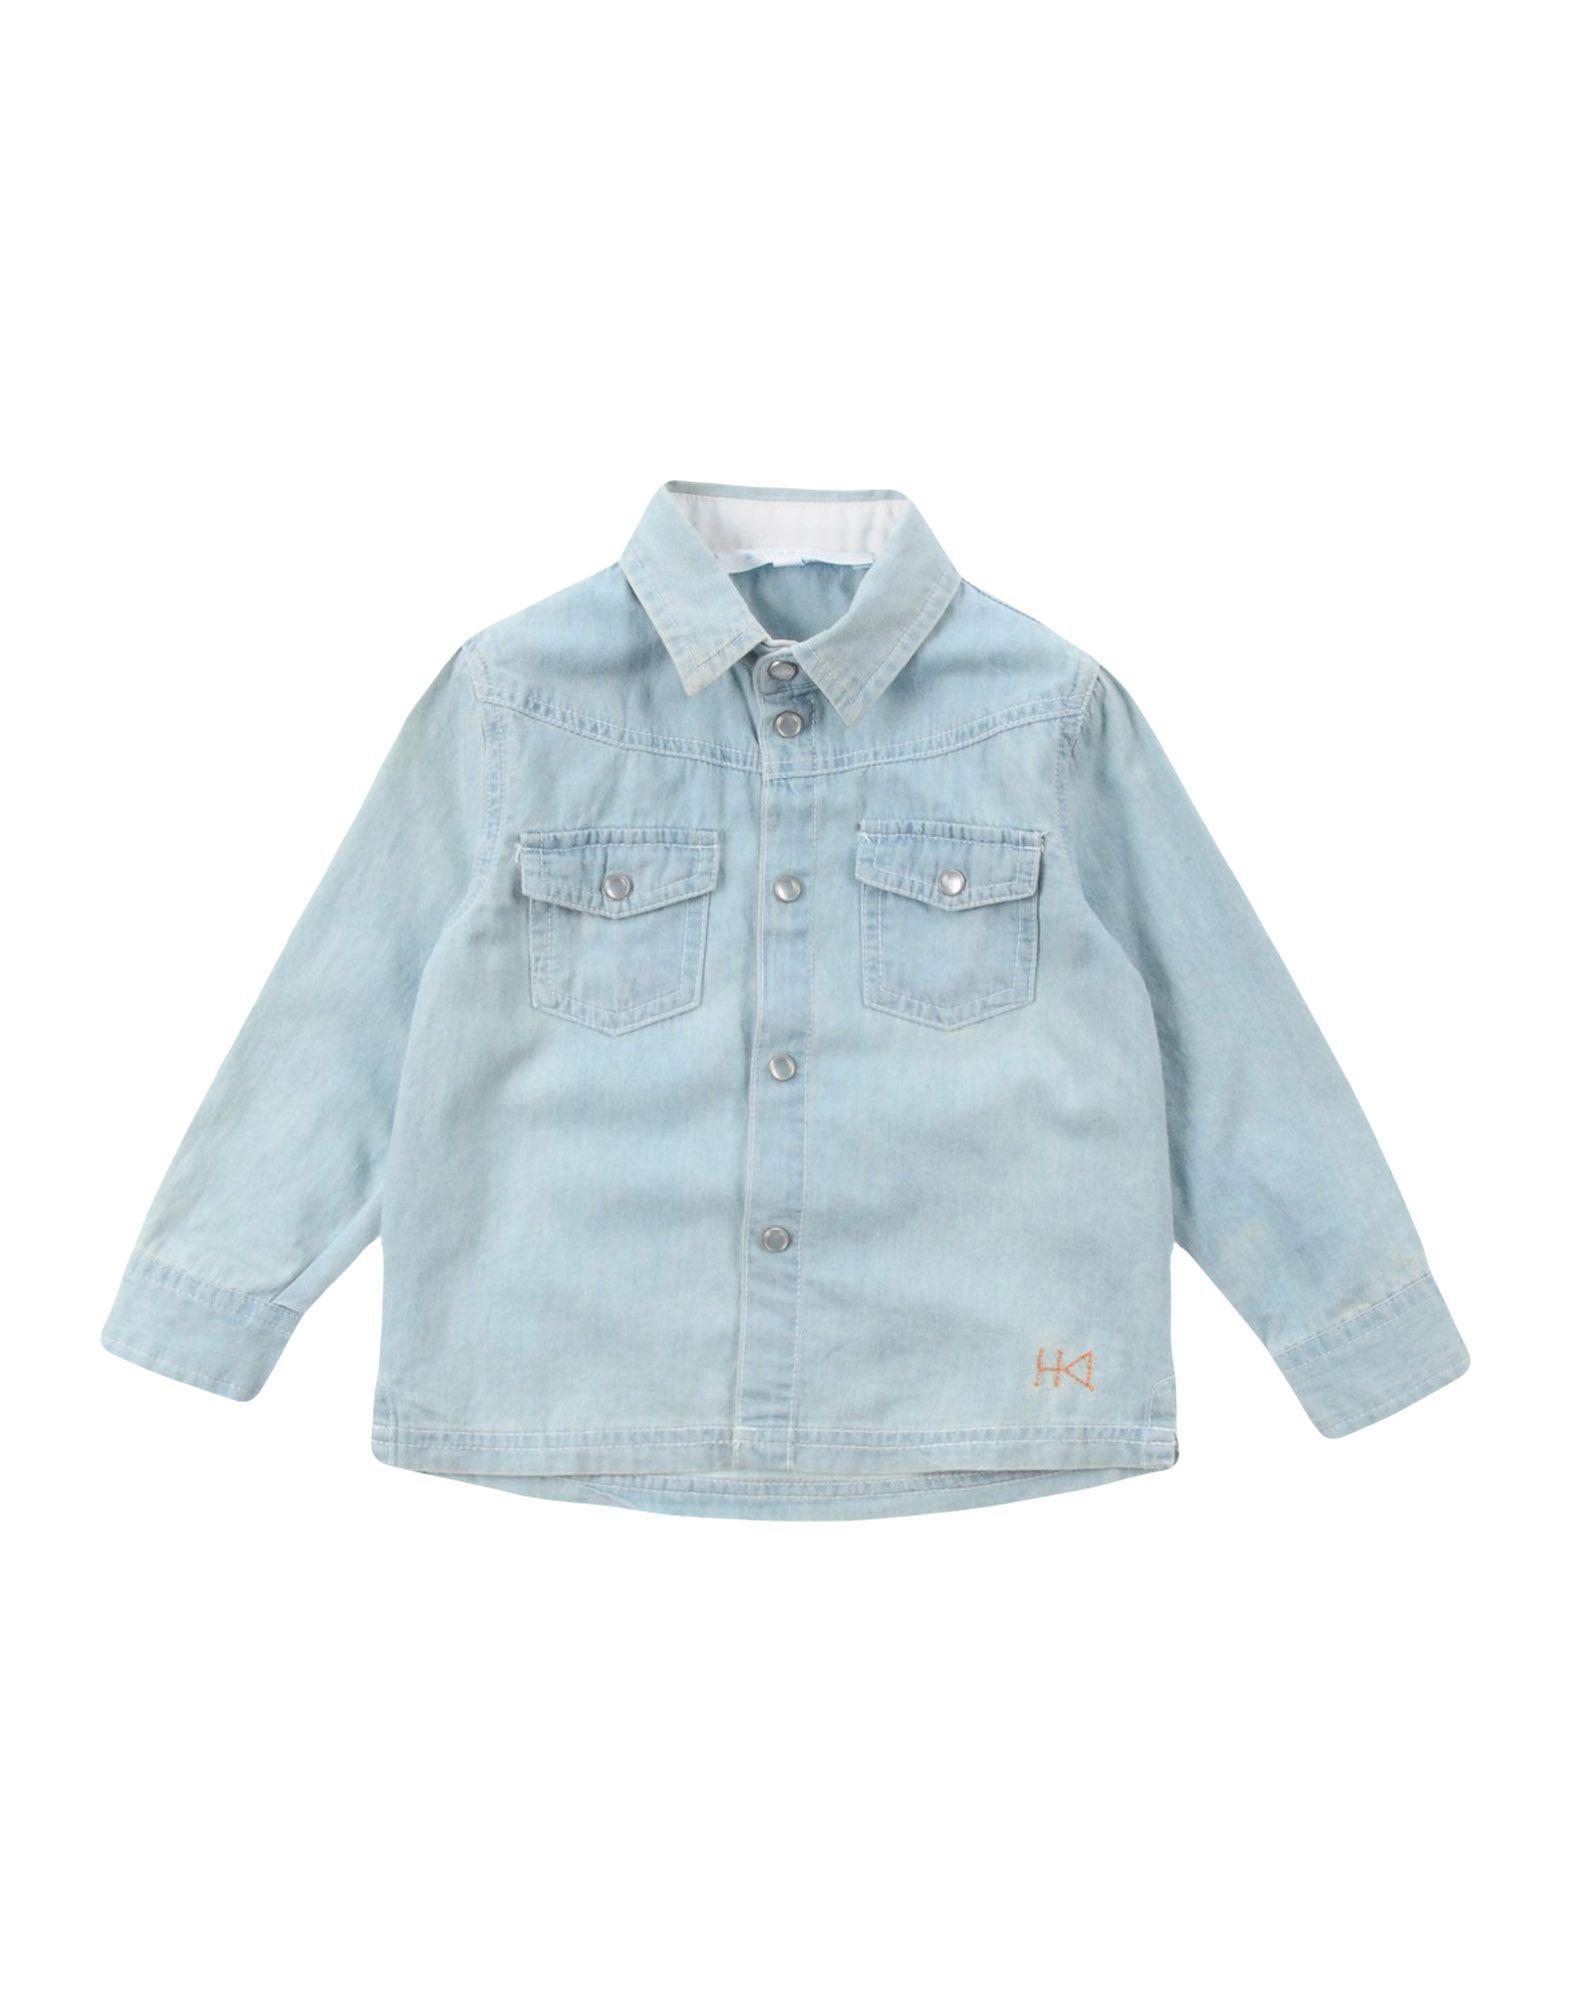 SILVIAN HEACH KIDS Джинсовая рубашка рубашка silvian heach kids рубашка